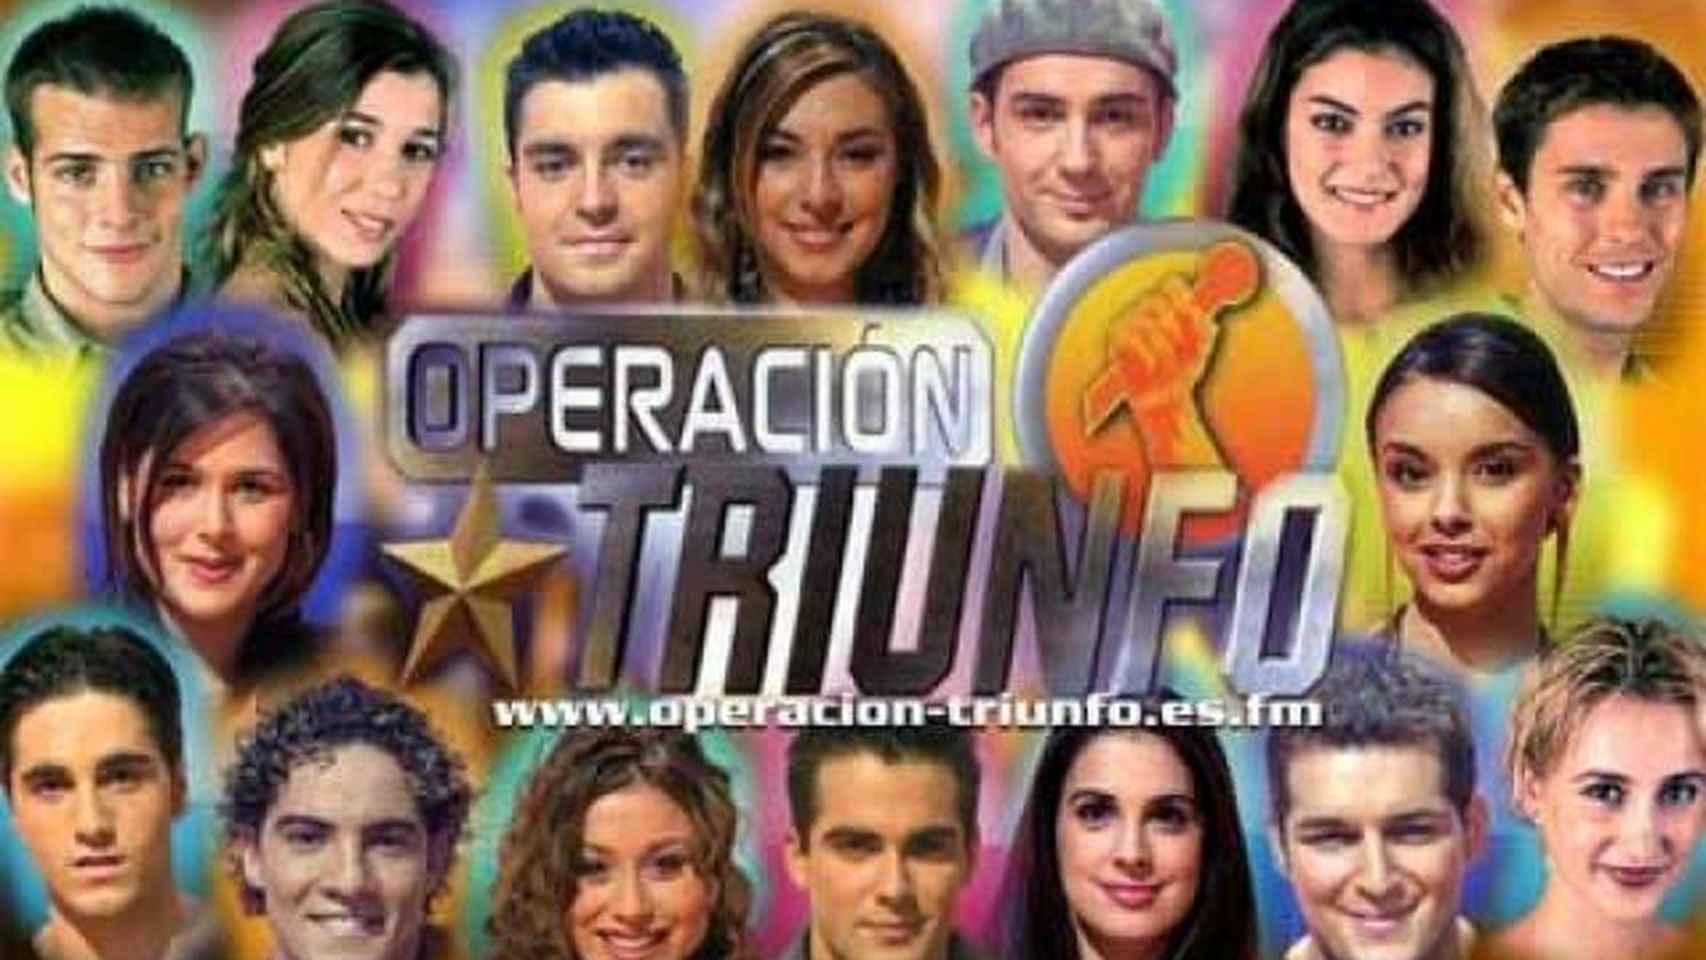 Operacion_Triunfo-David_Bisbal-David_Bustamante-Chenoa-Corazon_130249097_6073644_1706x960